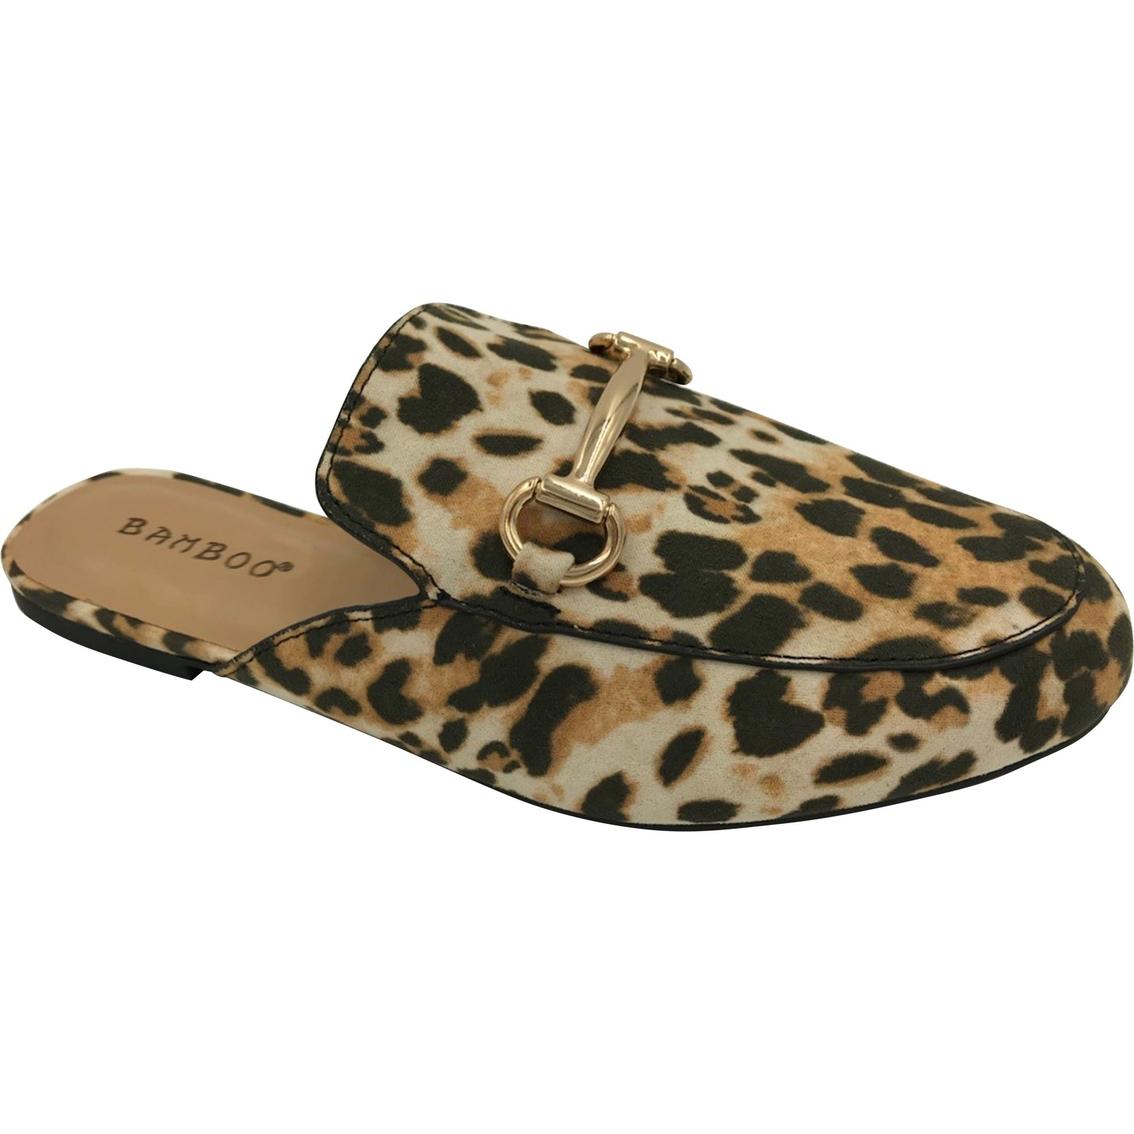 4d06ed1ae5 Bamboo Women's Leopard Print Flat Slide On Mule Shoes | Flats ...